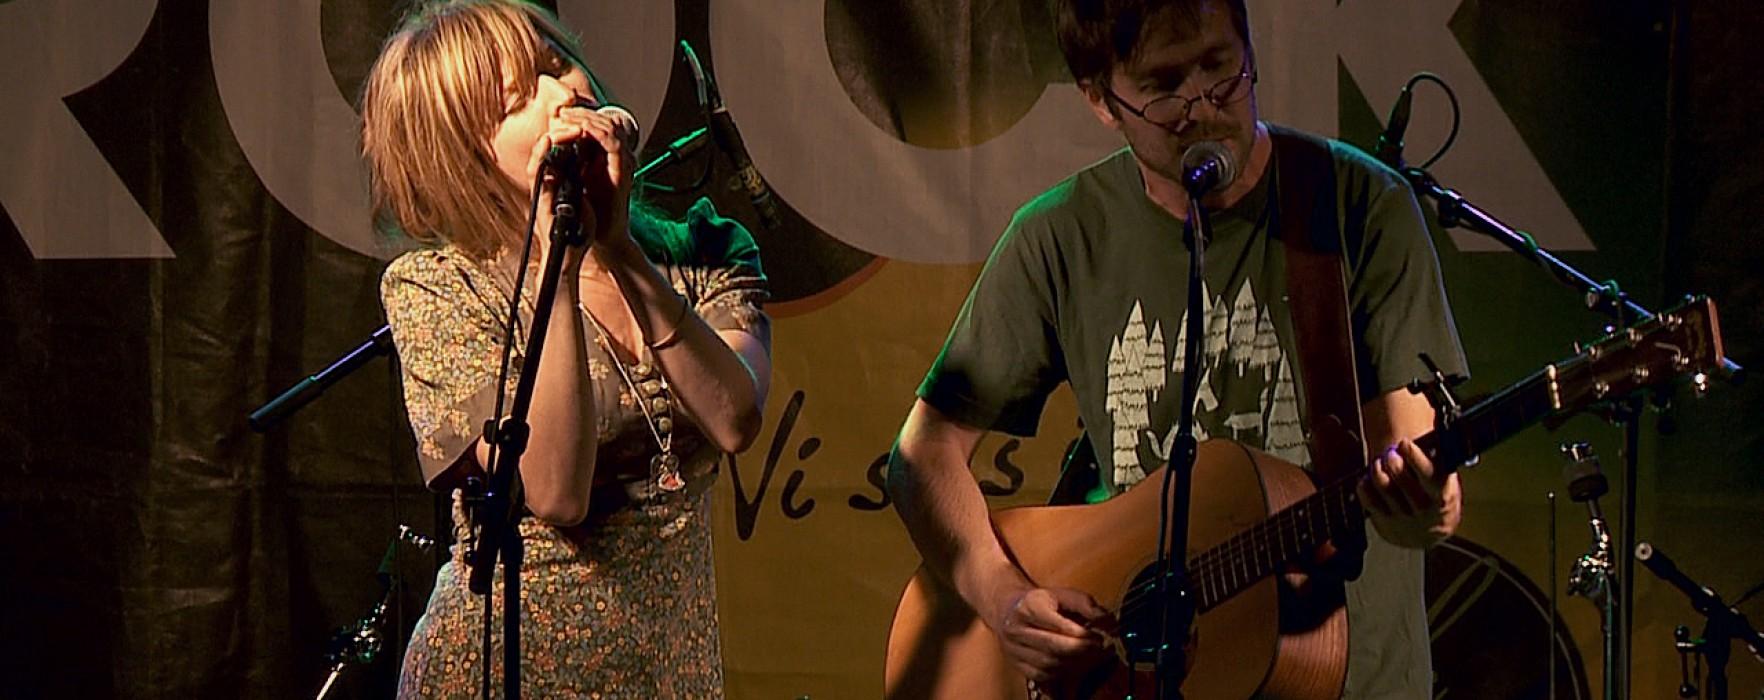 Glimt – Folk & Rock i Segmon, I'm Kingfisher (ep 2:6)